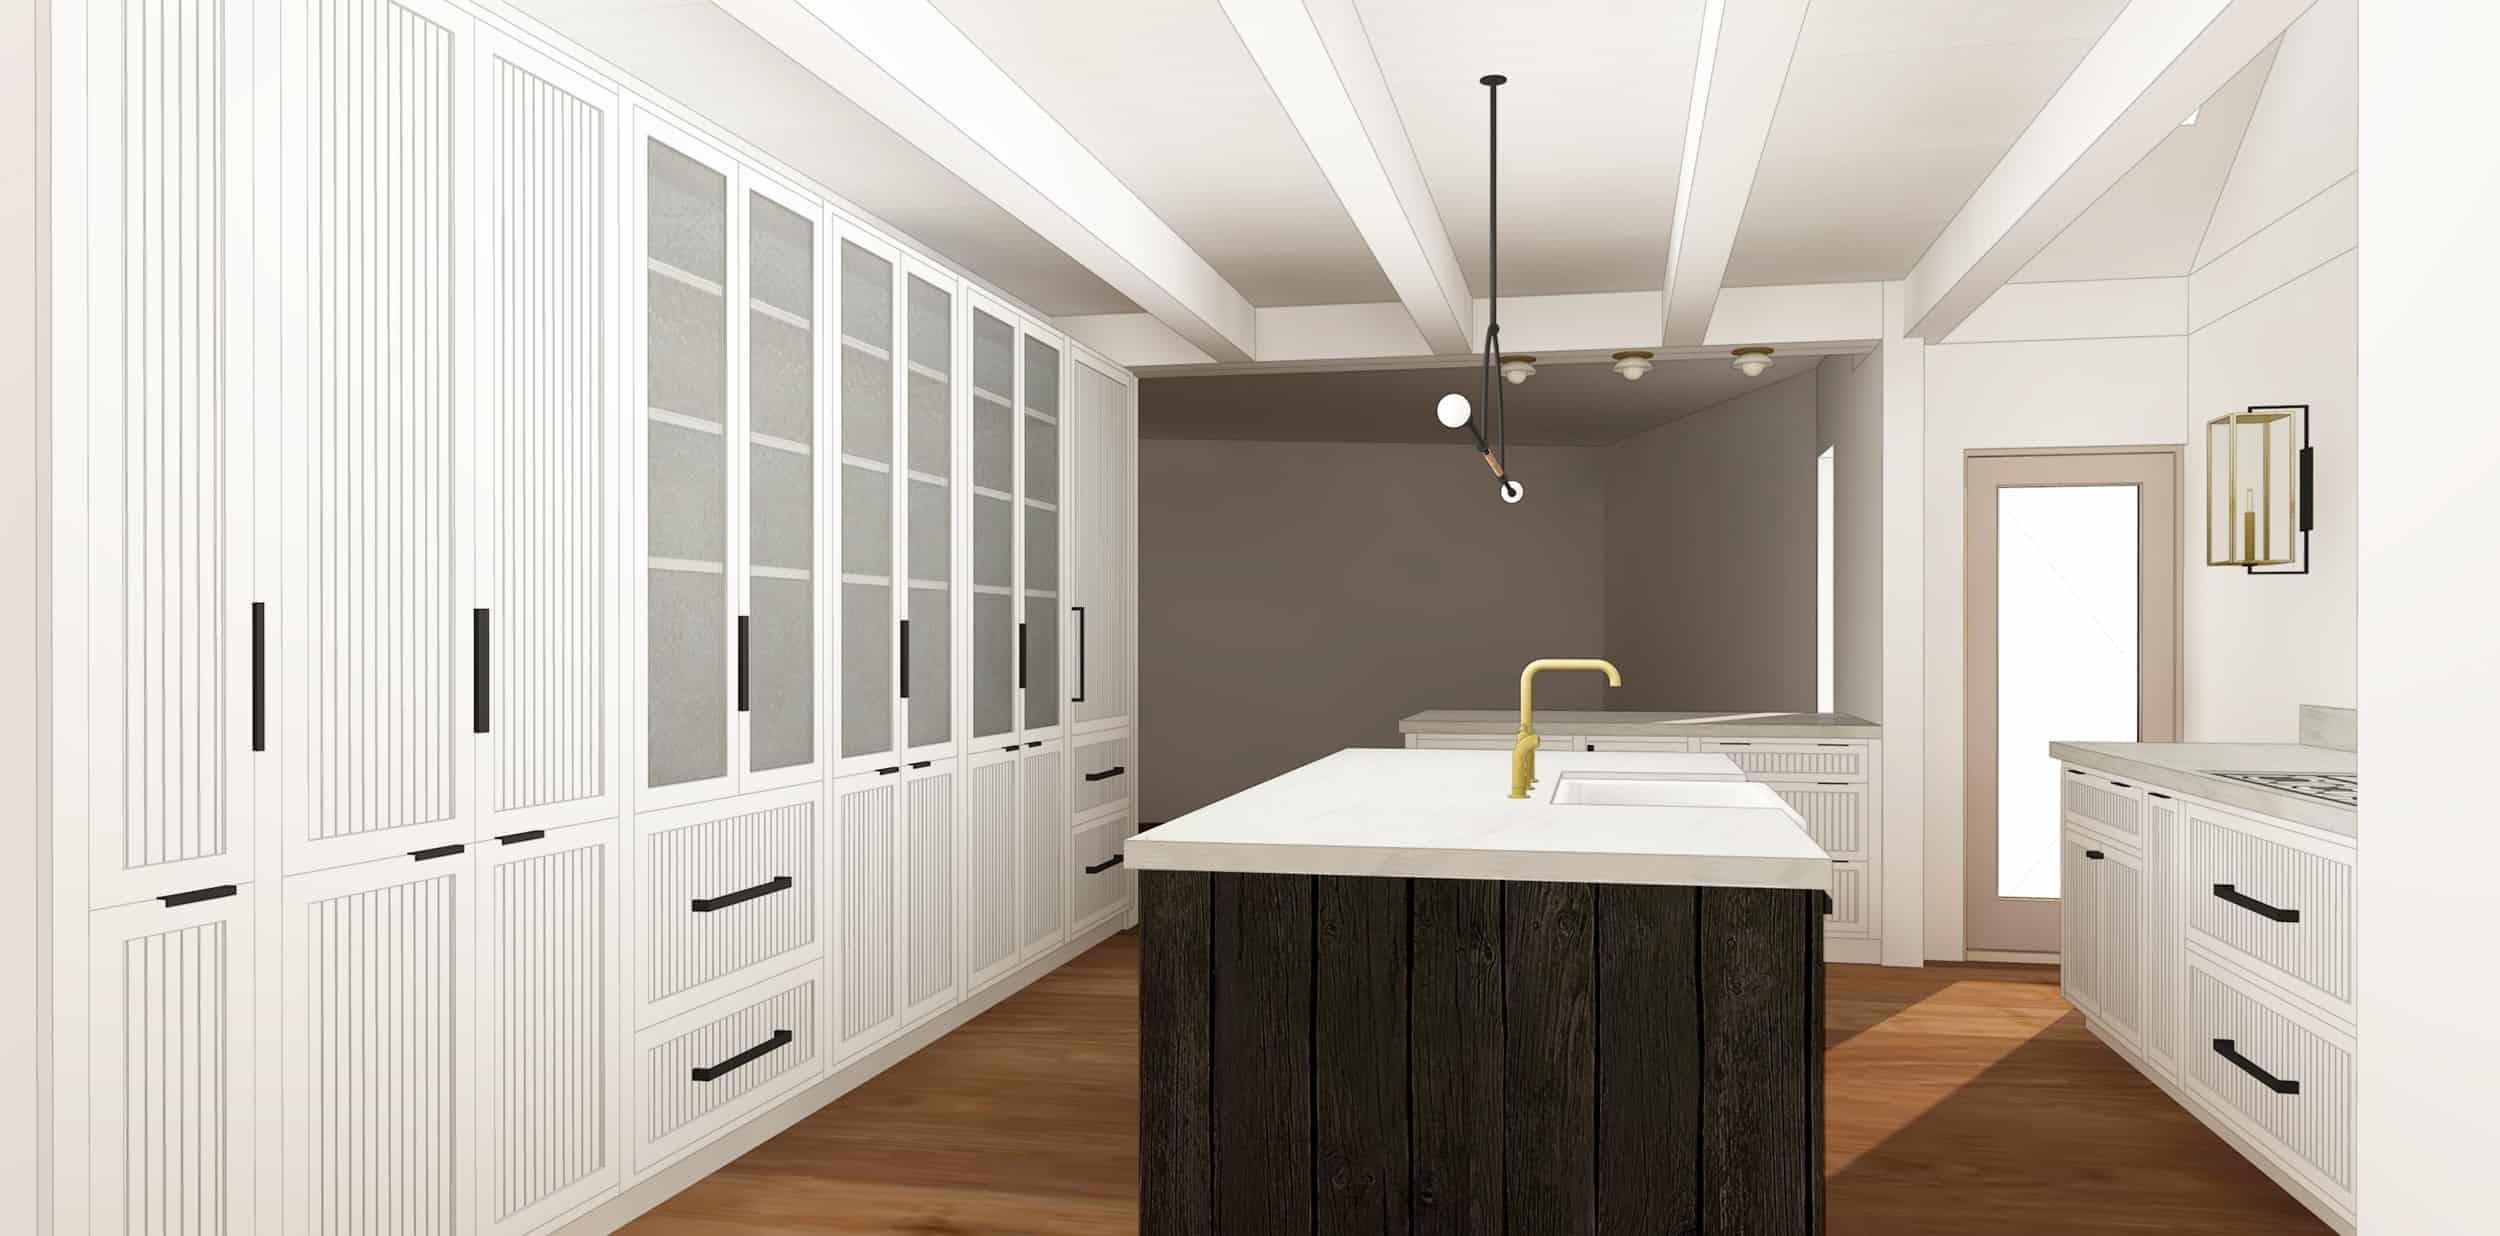 Emily Henderson Mountain House Kitchen Evolution Kitchensumnt Grooved Shaker Glass 02